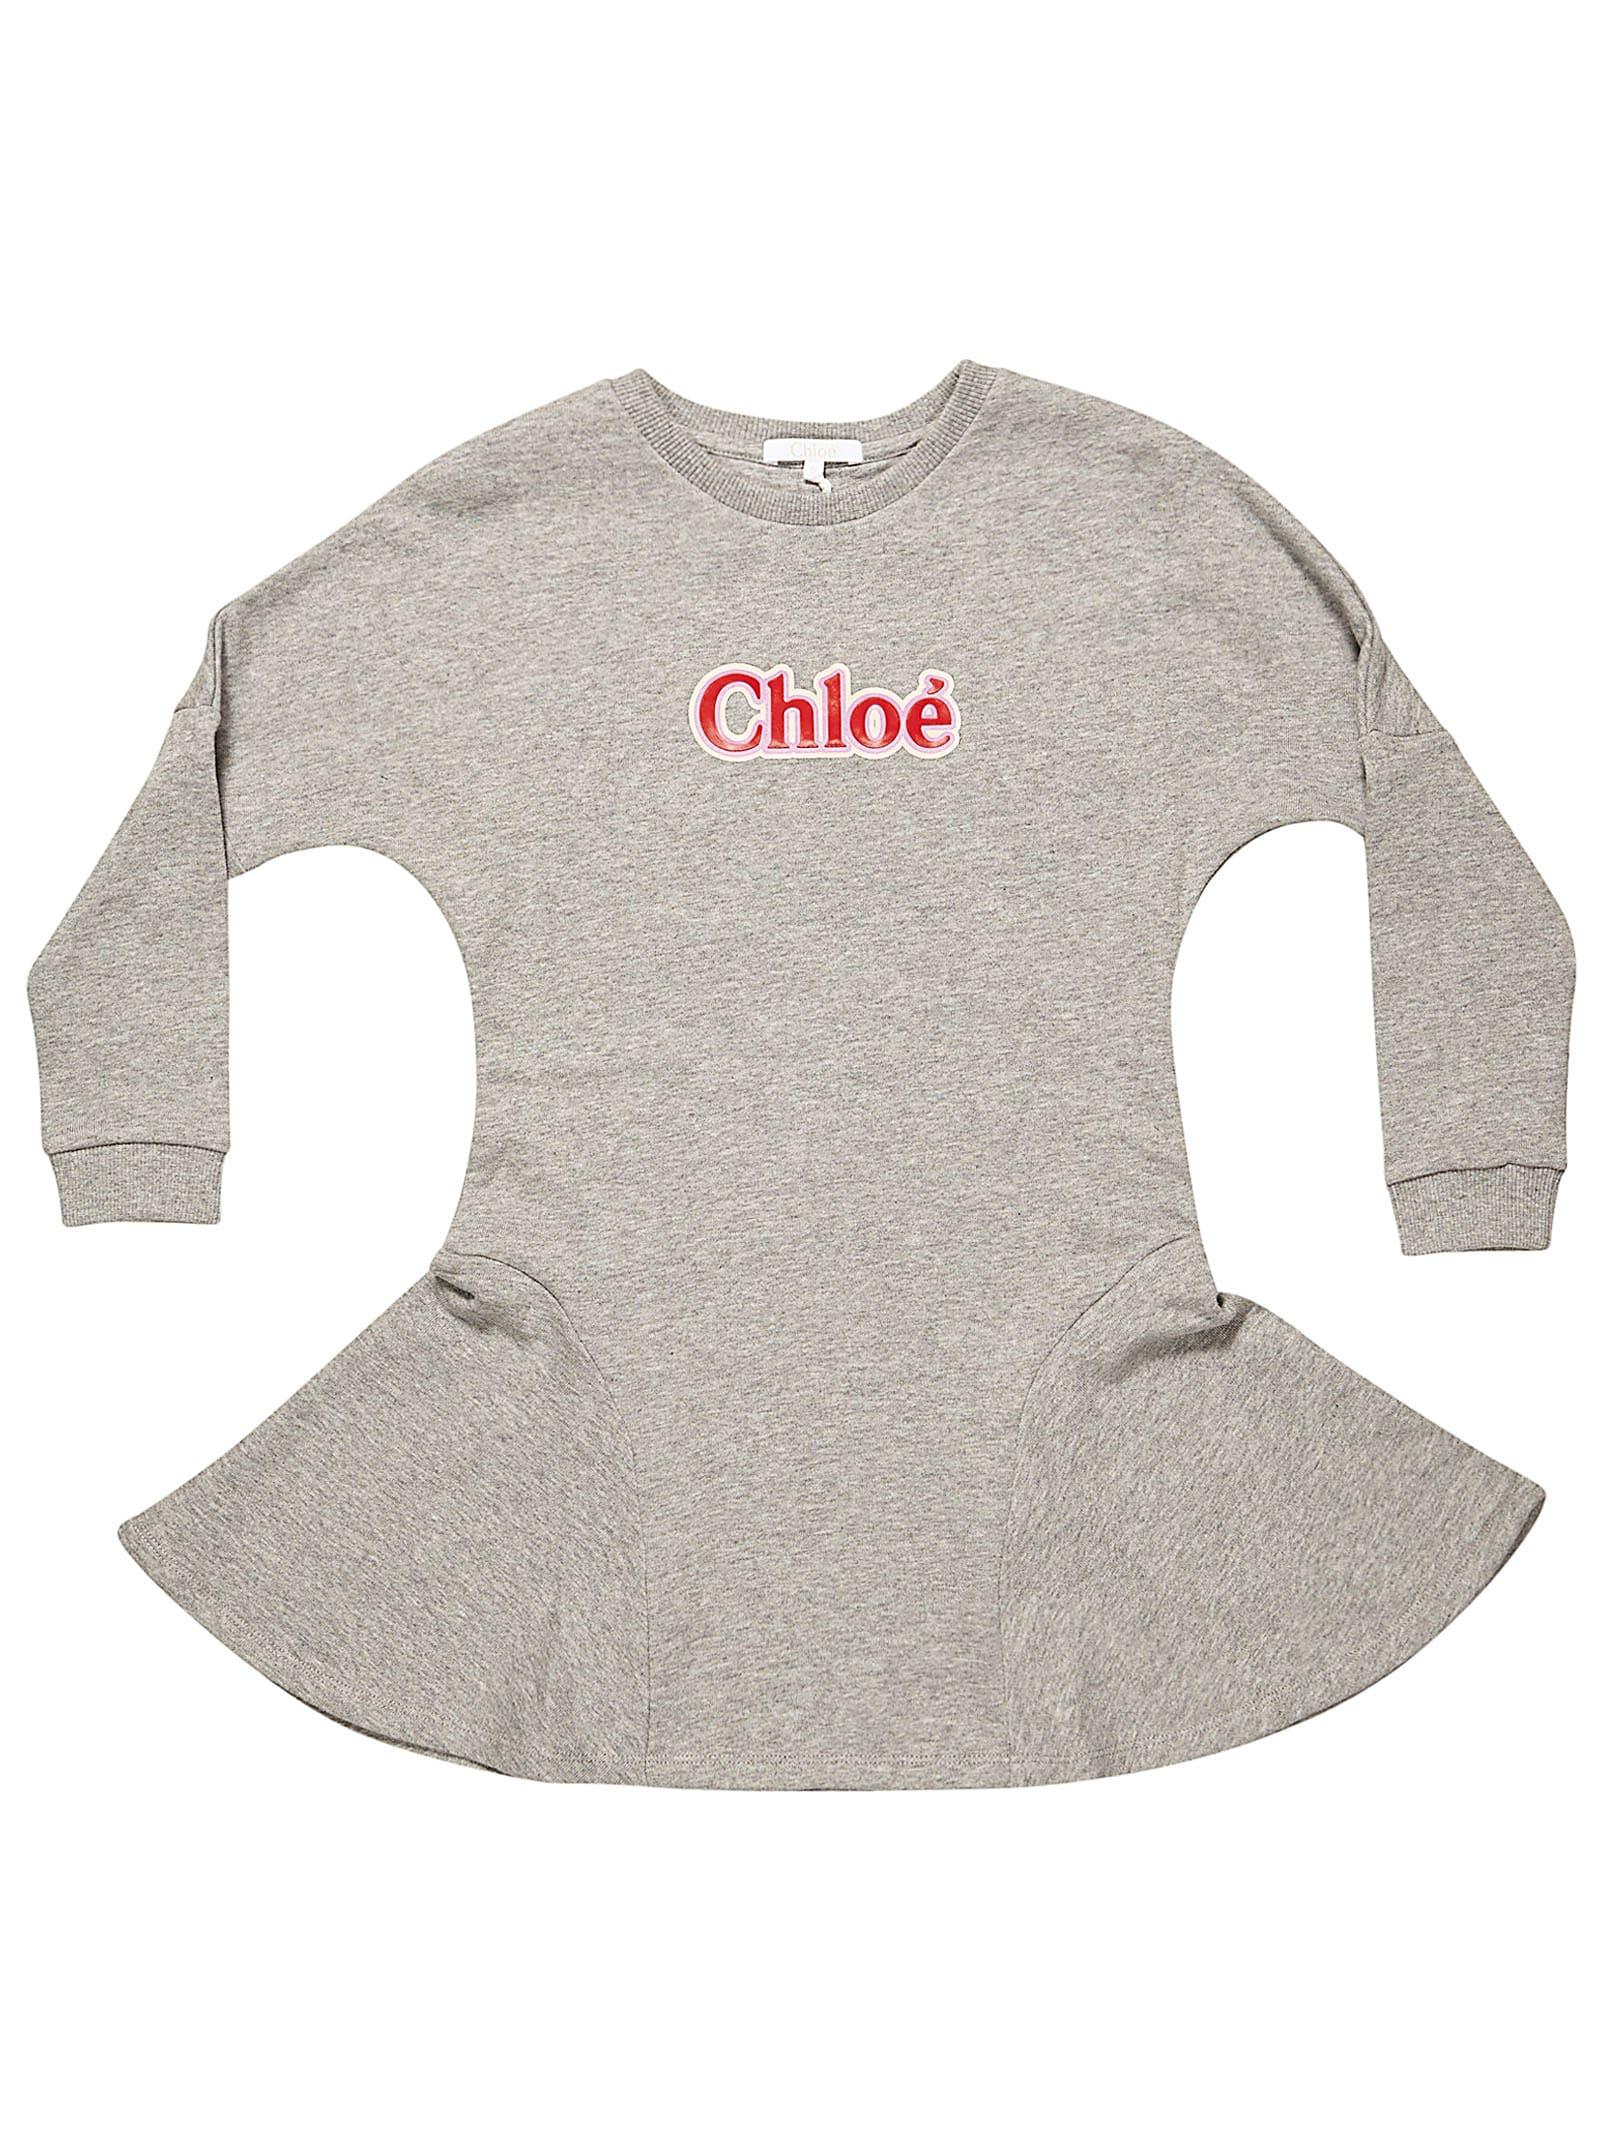 Chloé Logo Print Dress